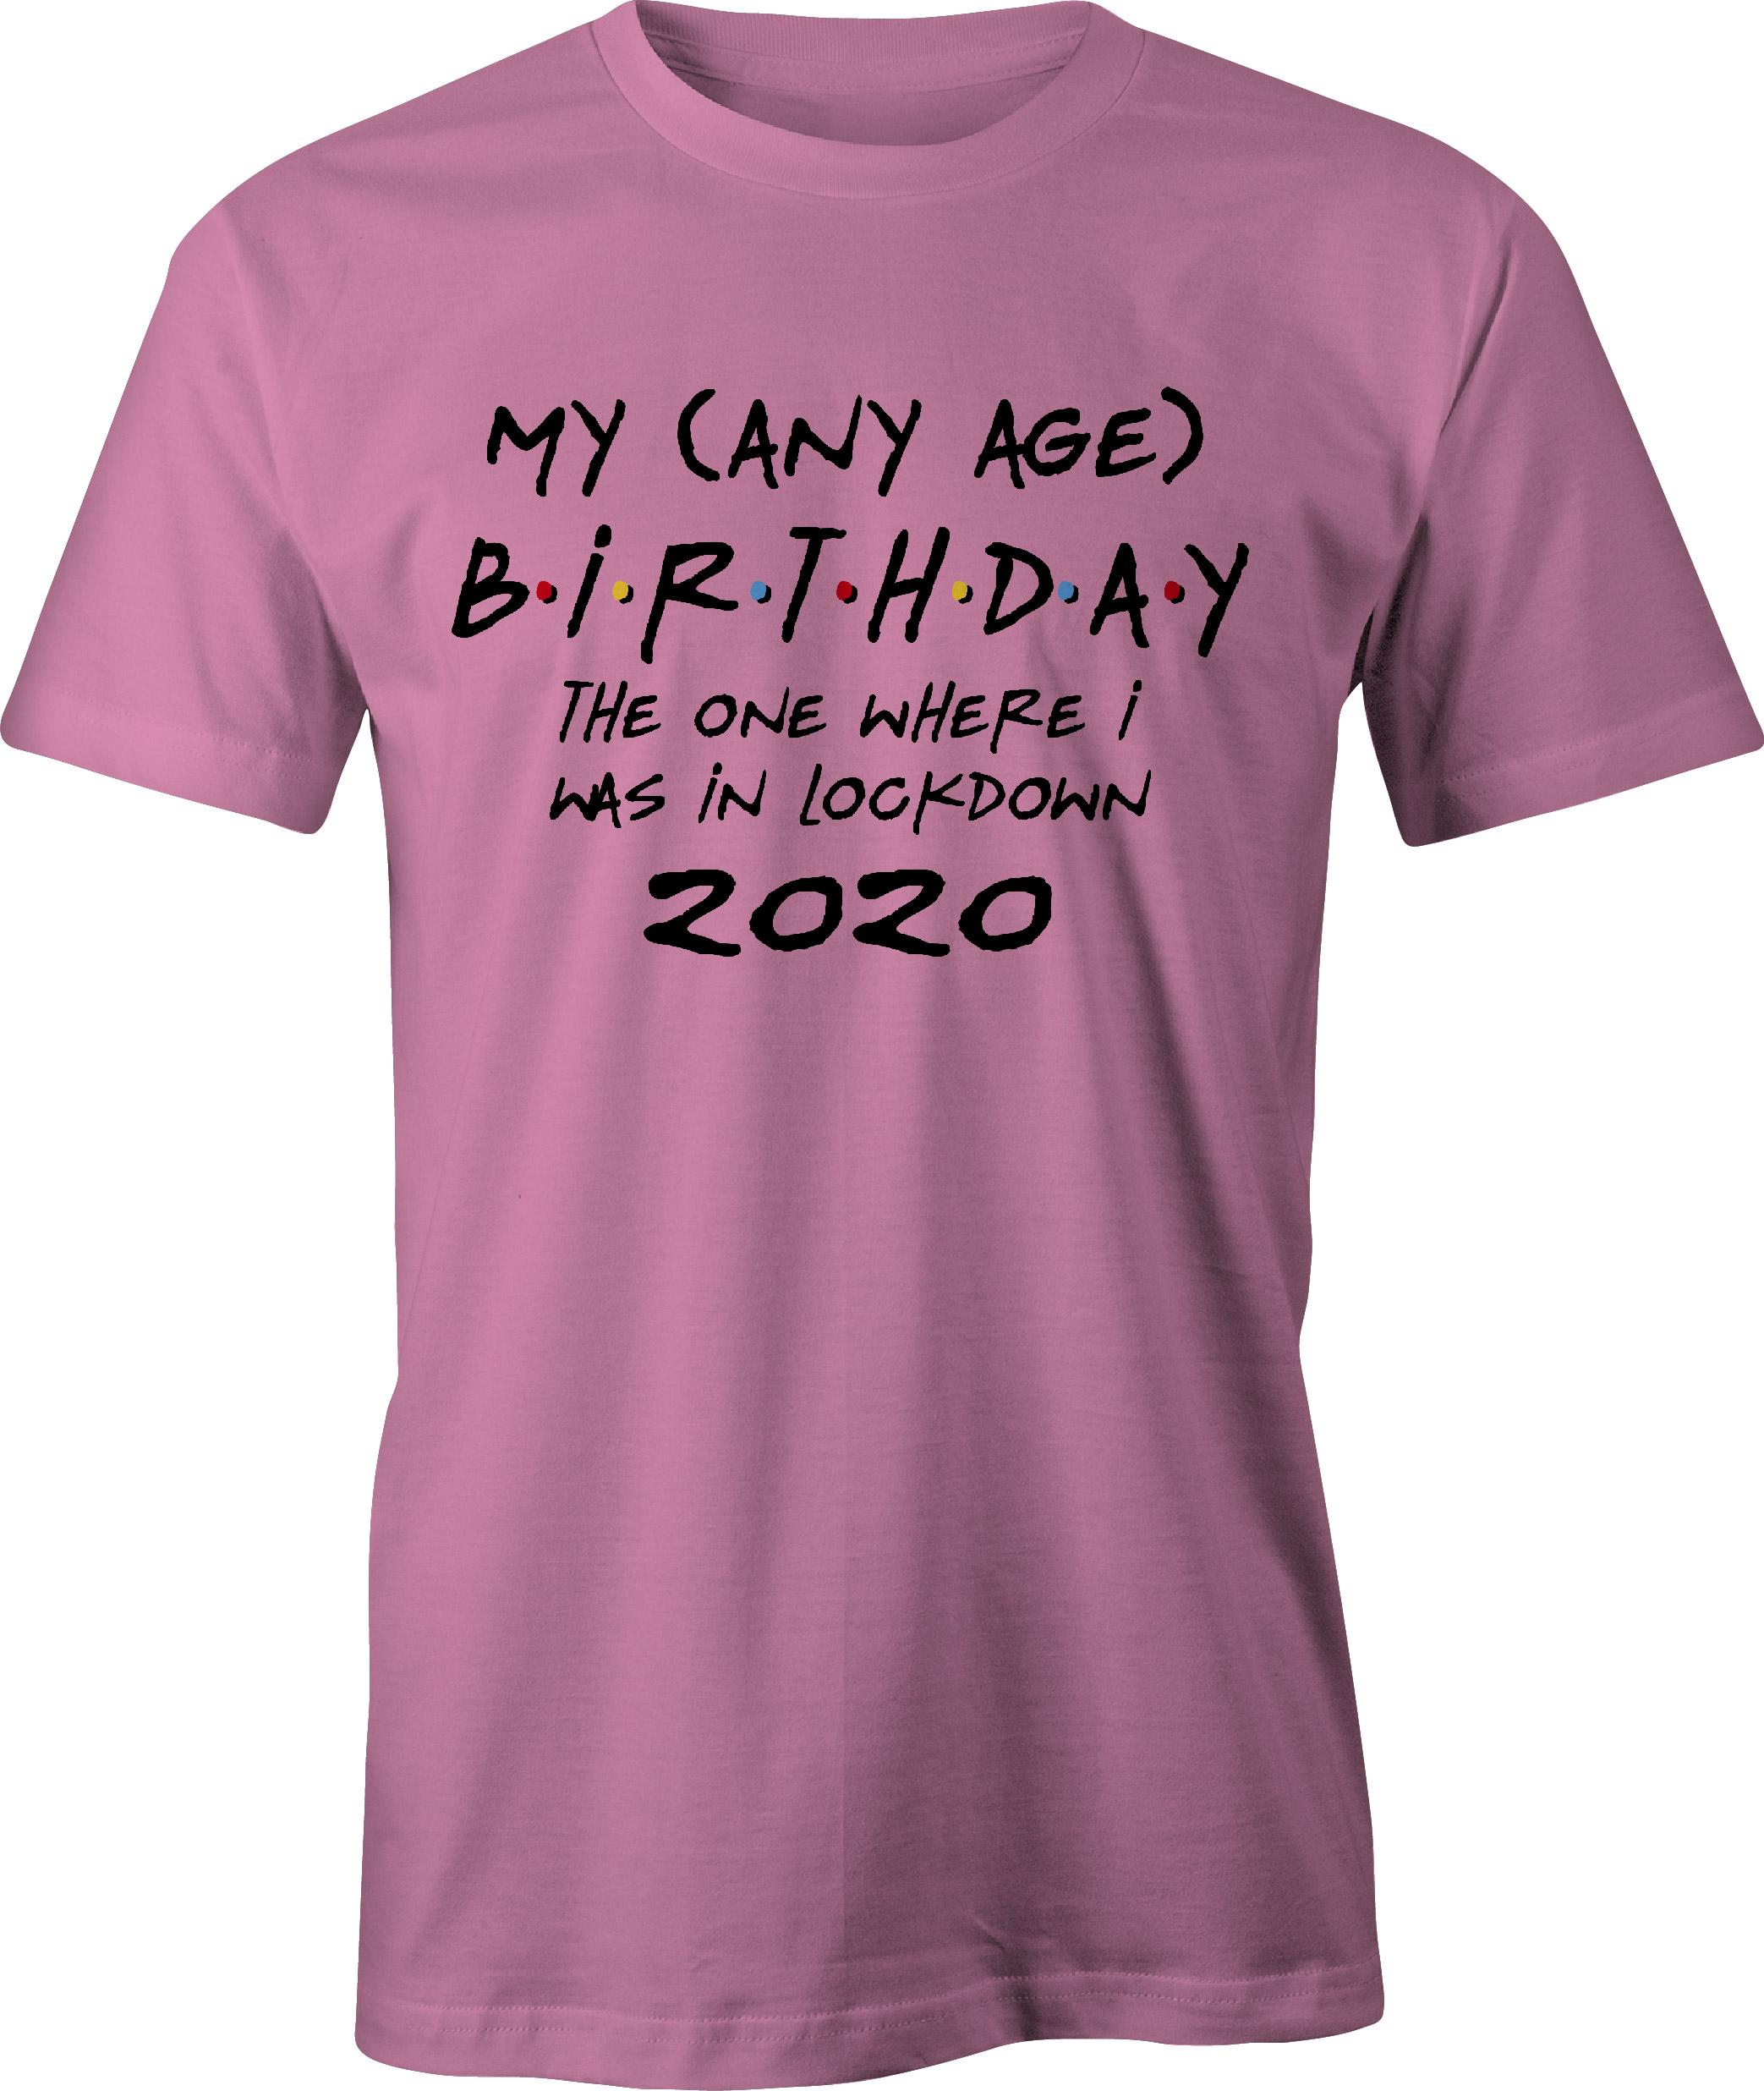 Any age birthday lockdown t-shirt - pin